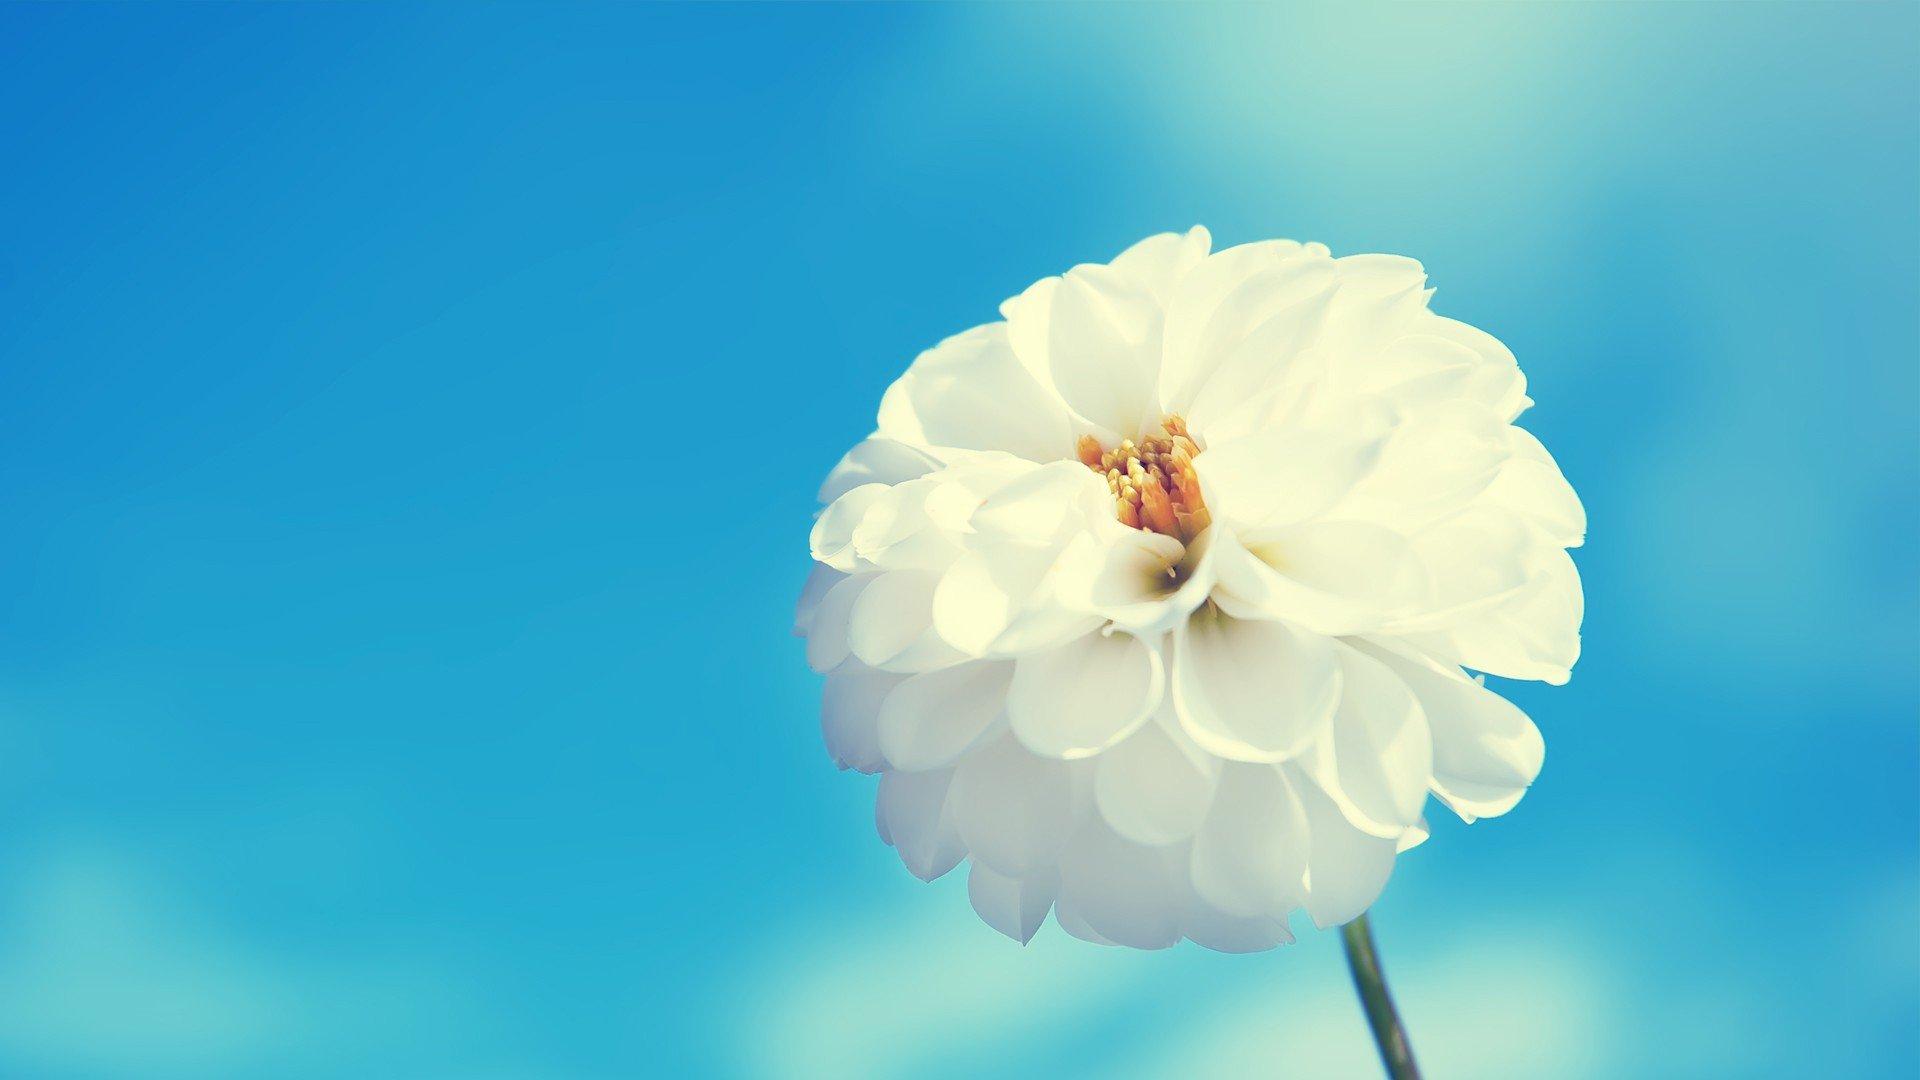 Beautiful Flower Hd Images High Resolution Flowers Hd 1920x1080 Wallpaper Teahub Io